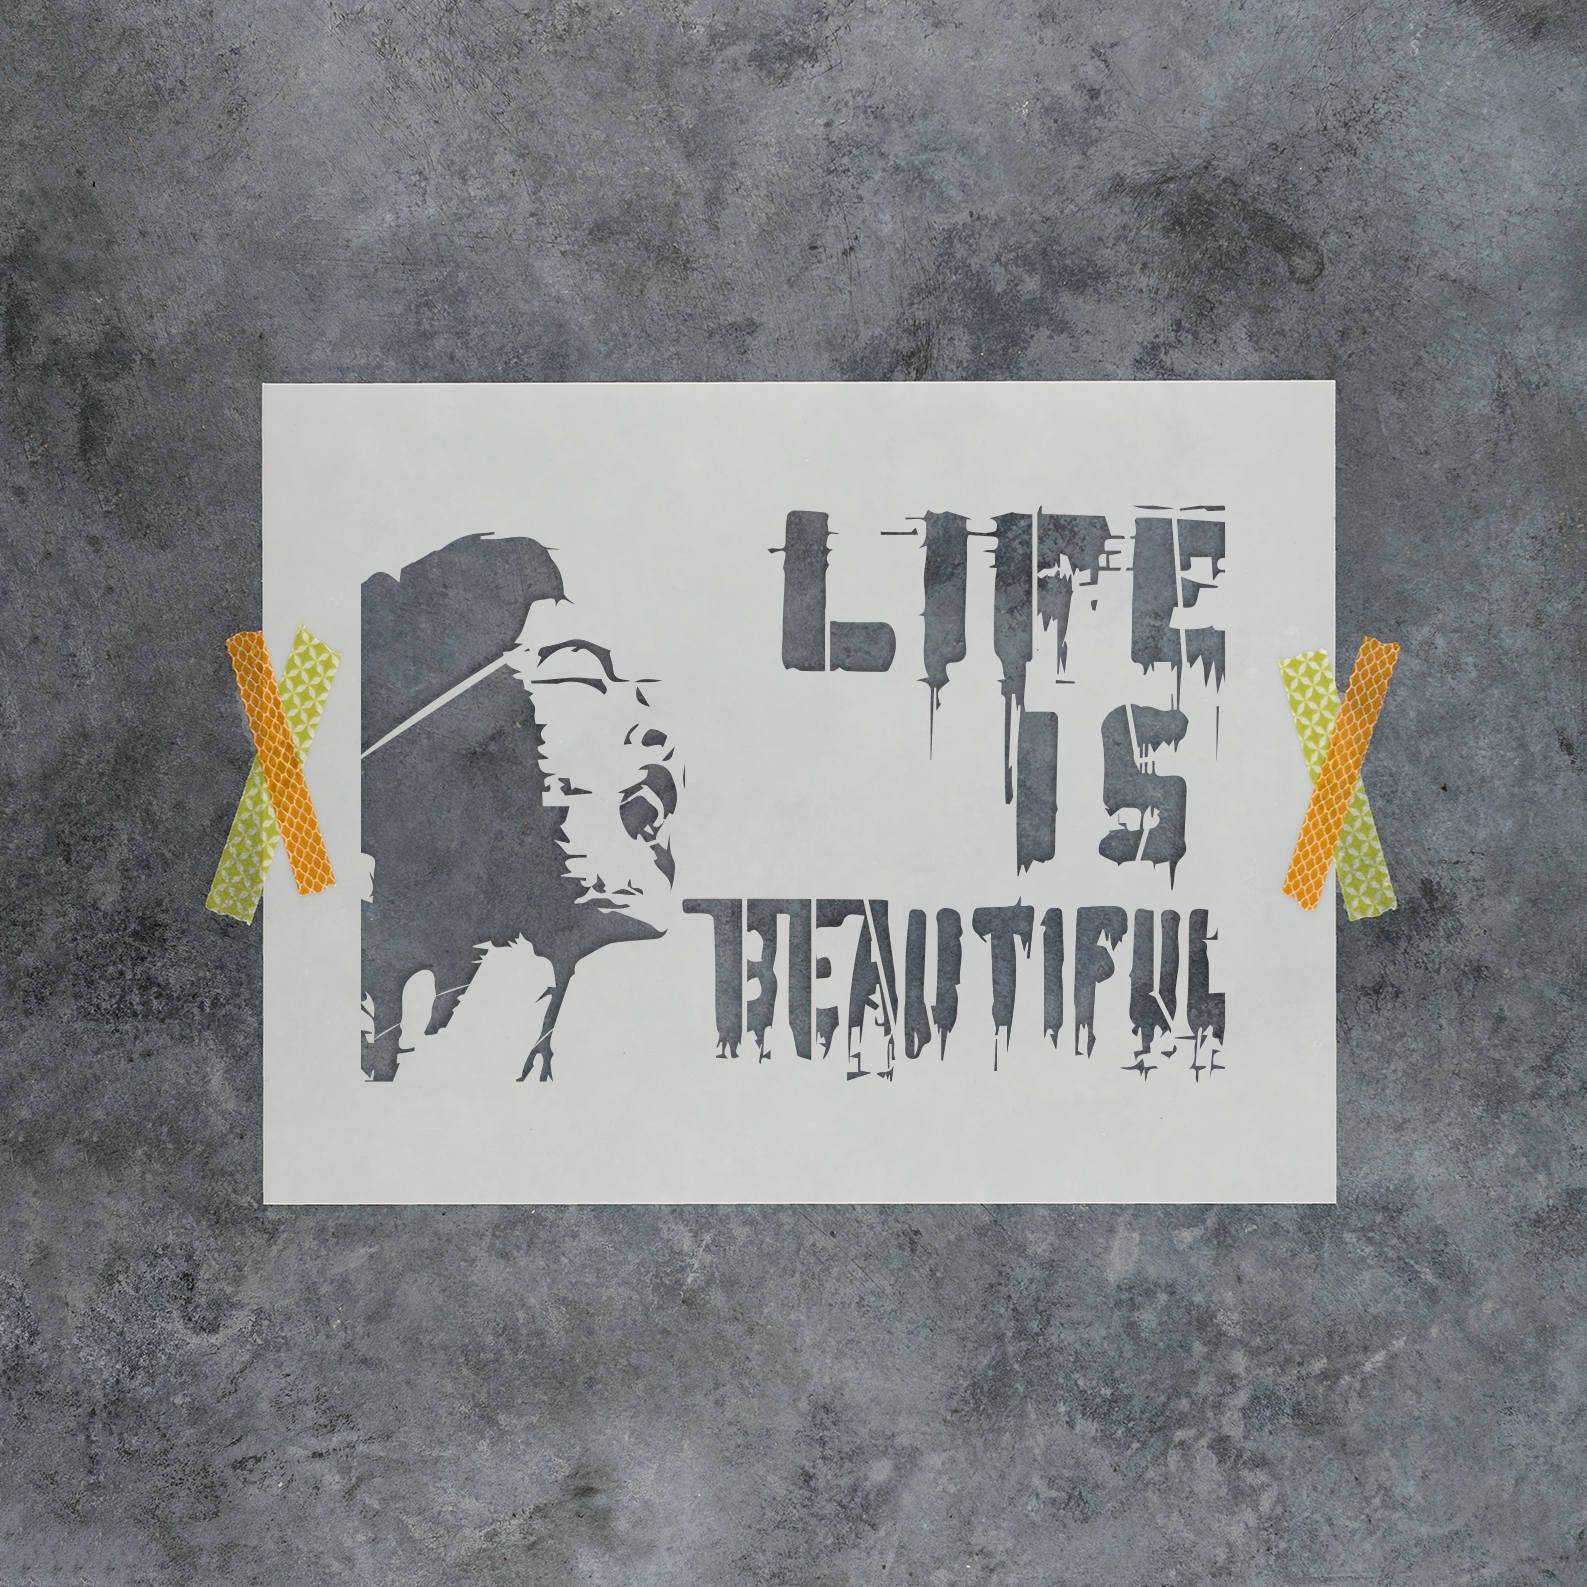 Life is beautiful banksy stencil reusable diy craft graffiti street art stencils of life is beautiful by banksy